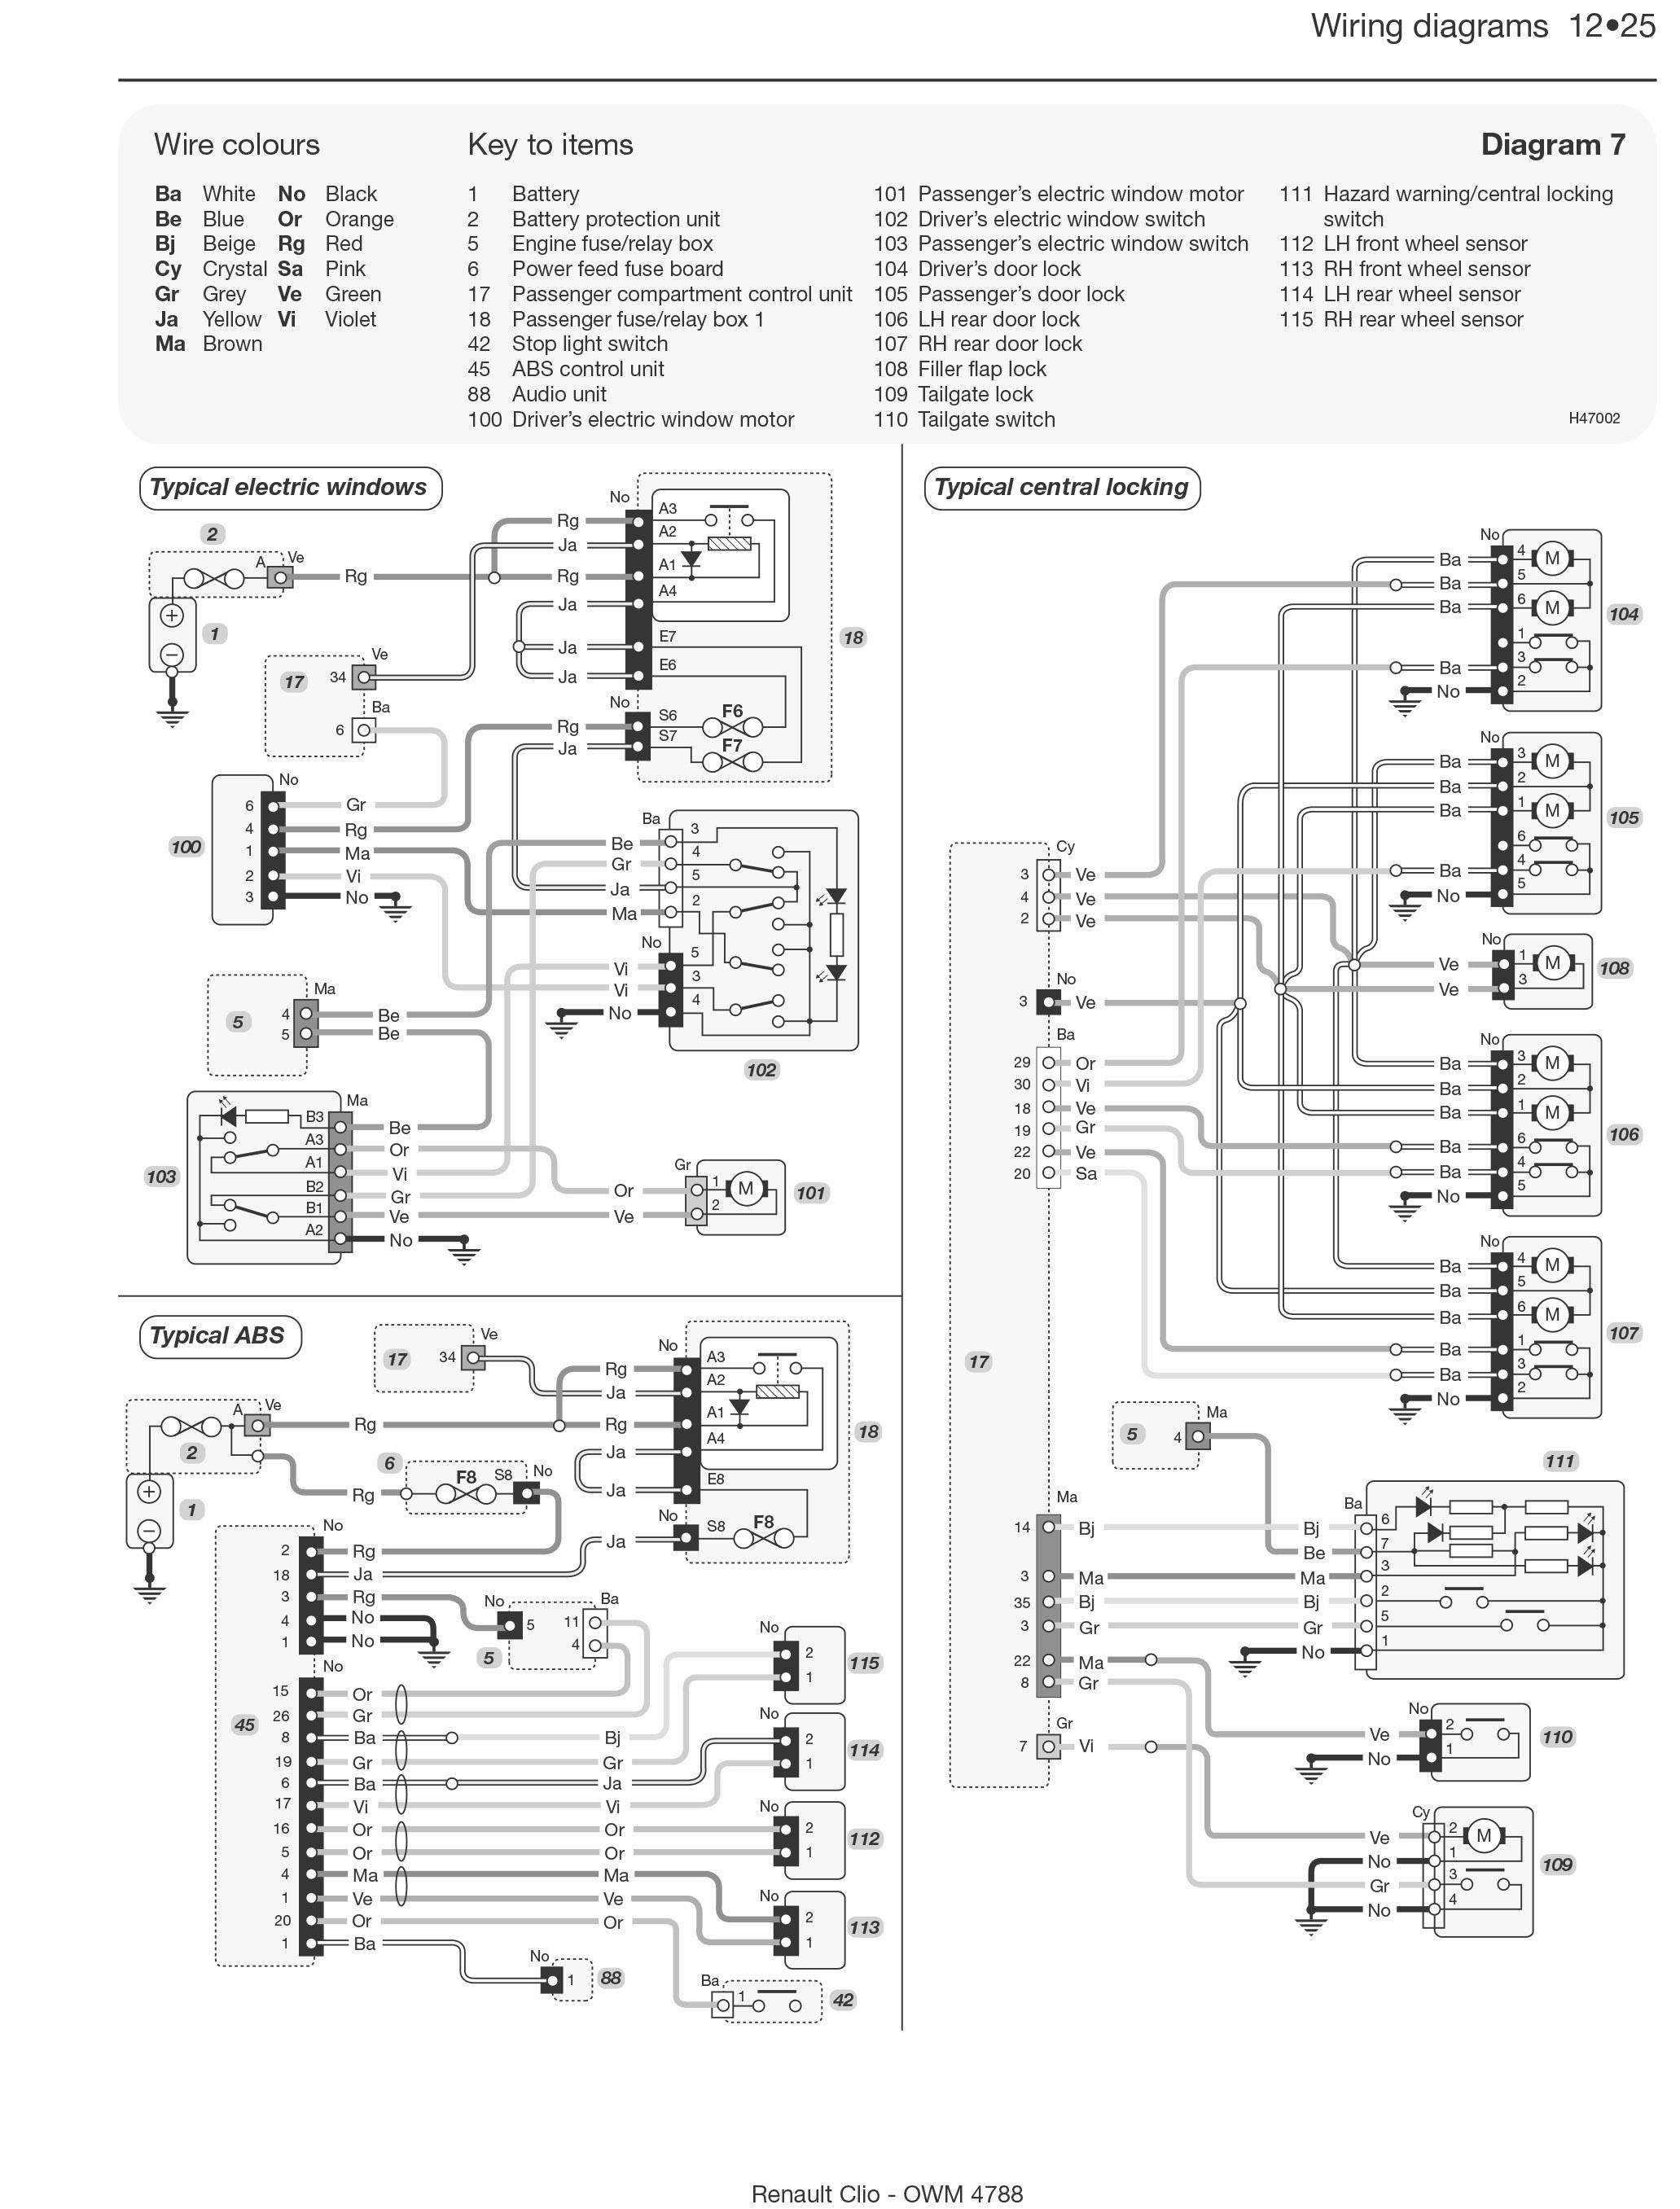 miata fuse box wiring